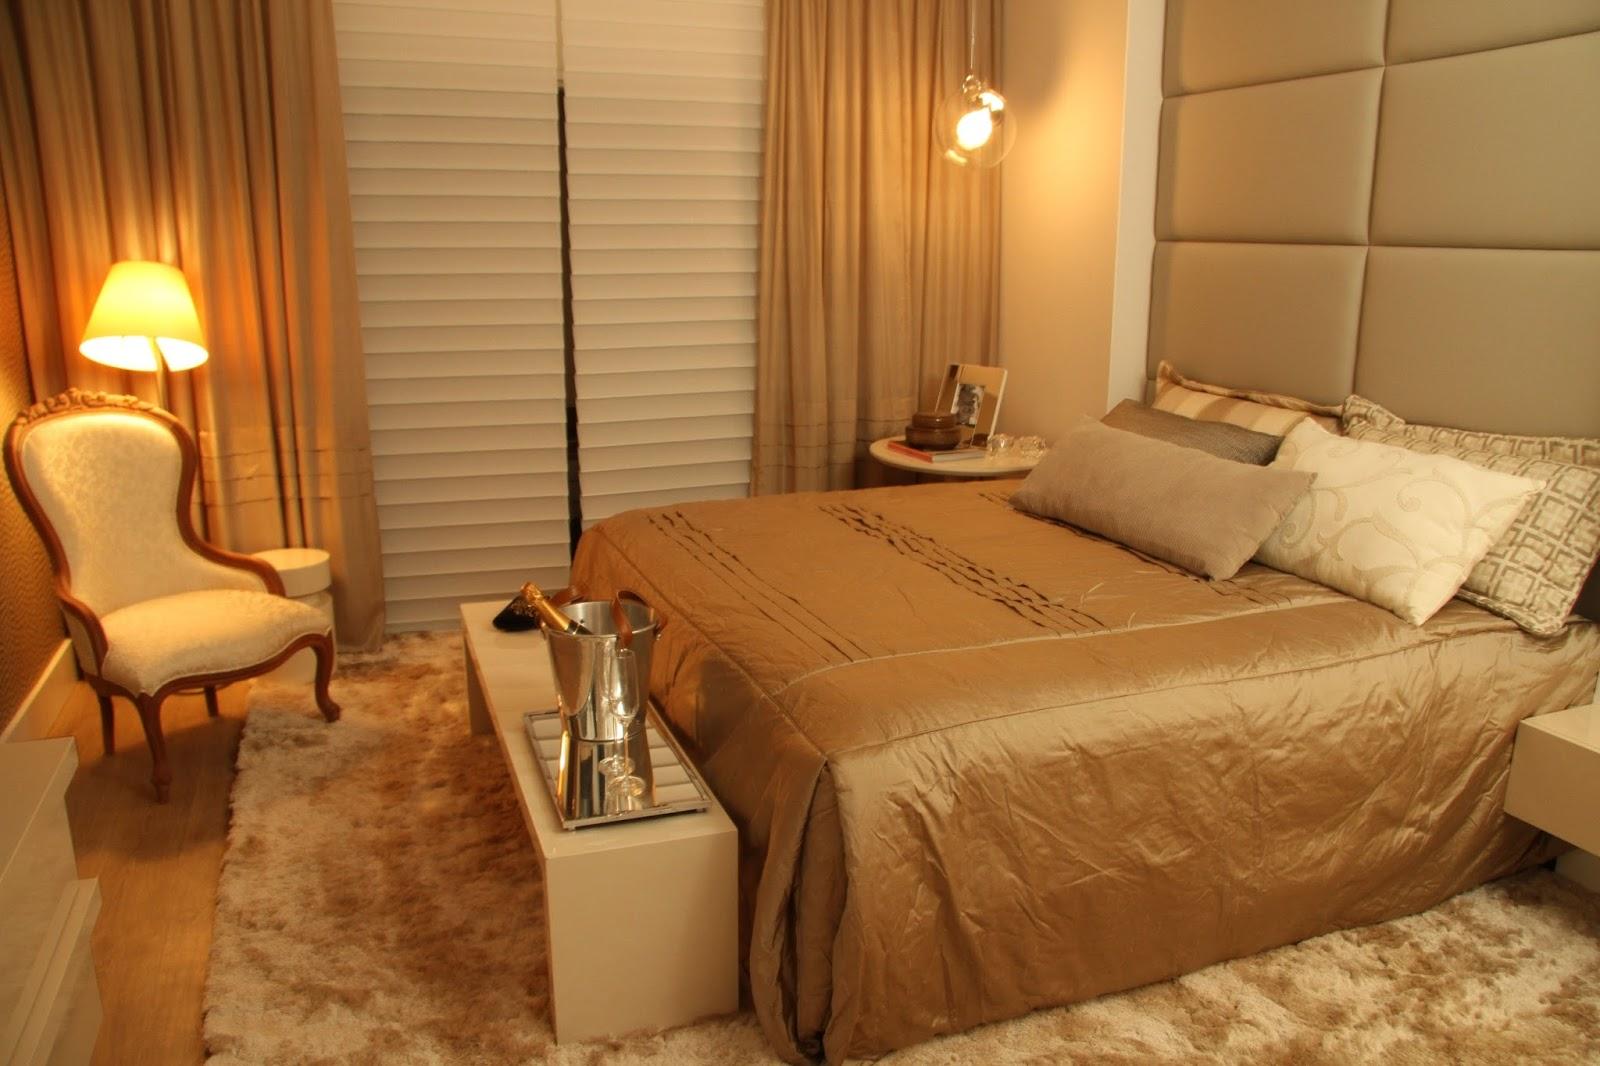 Design de interiores blog estudante interior estilos for Ambientes modernos interiores